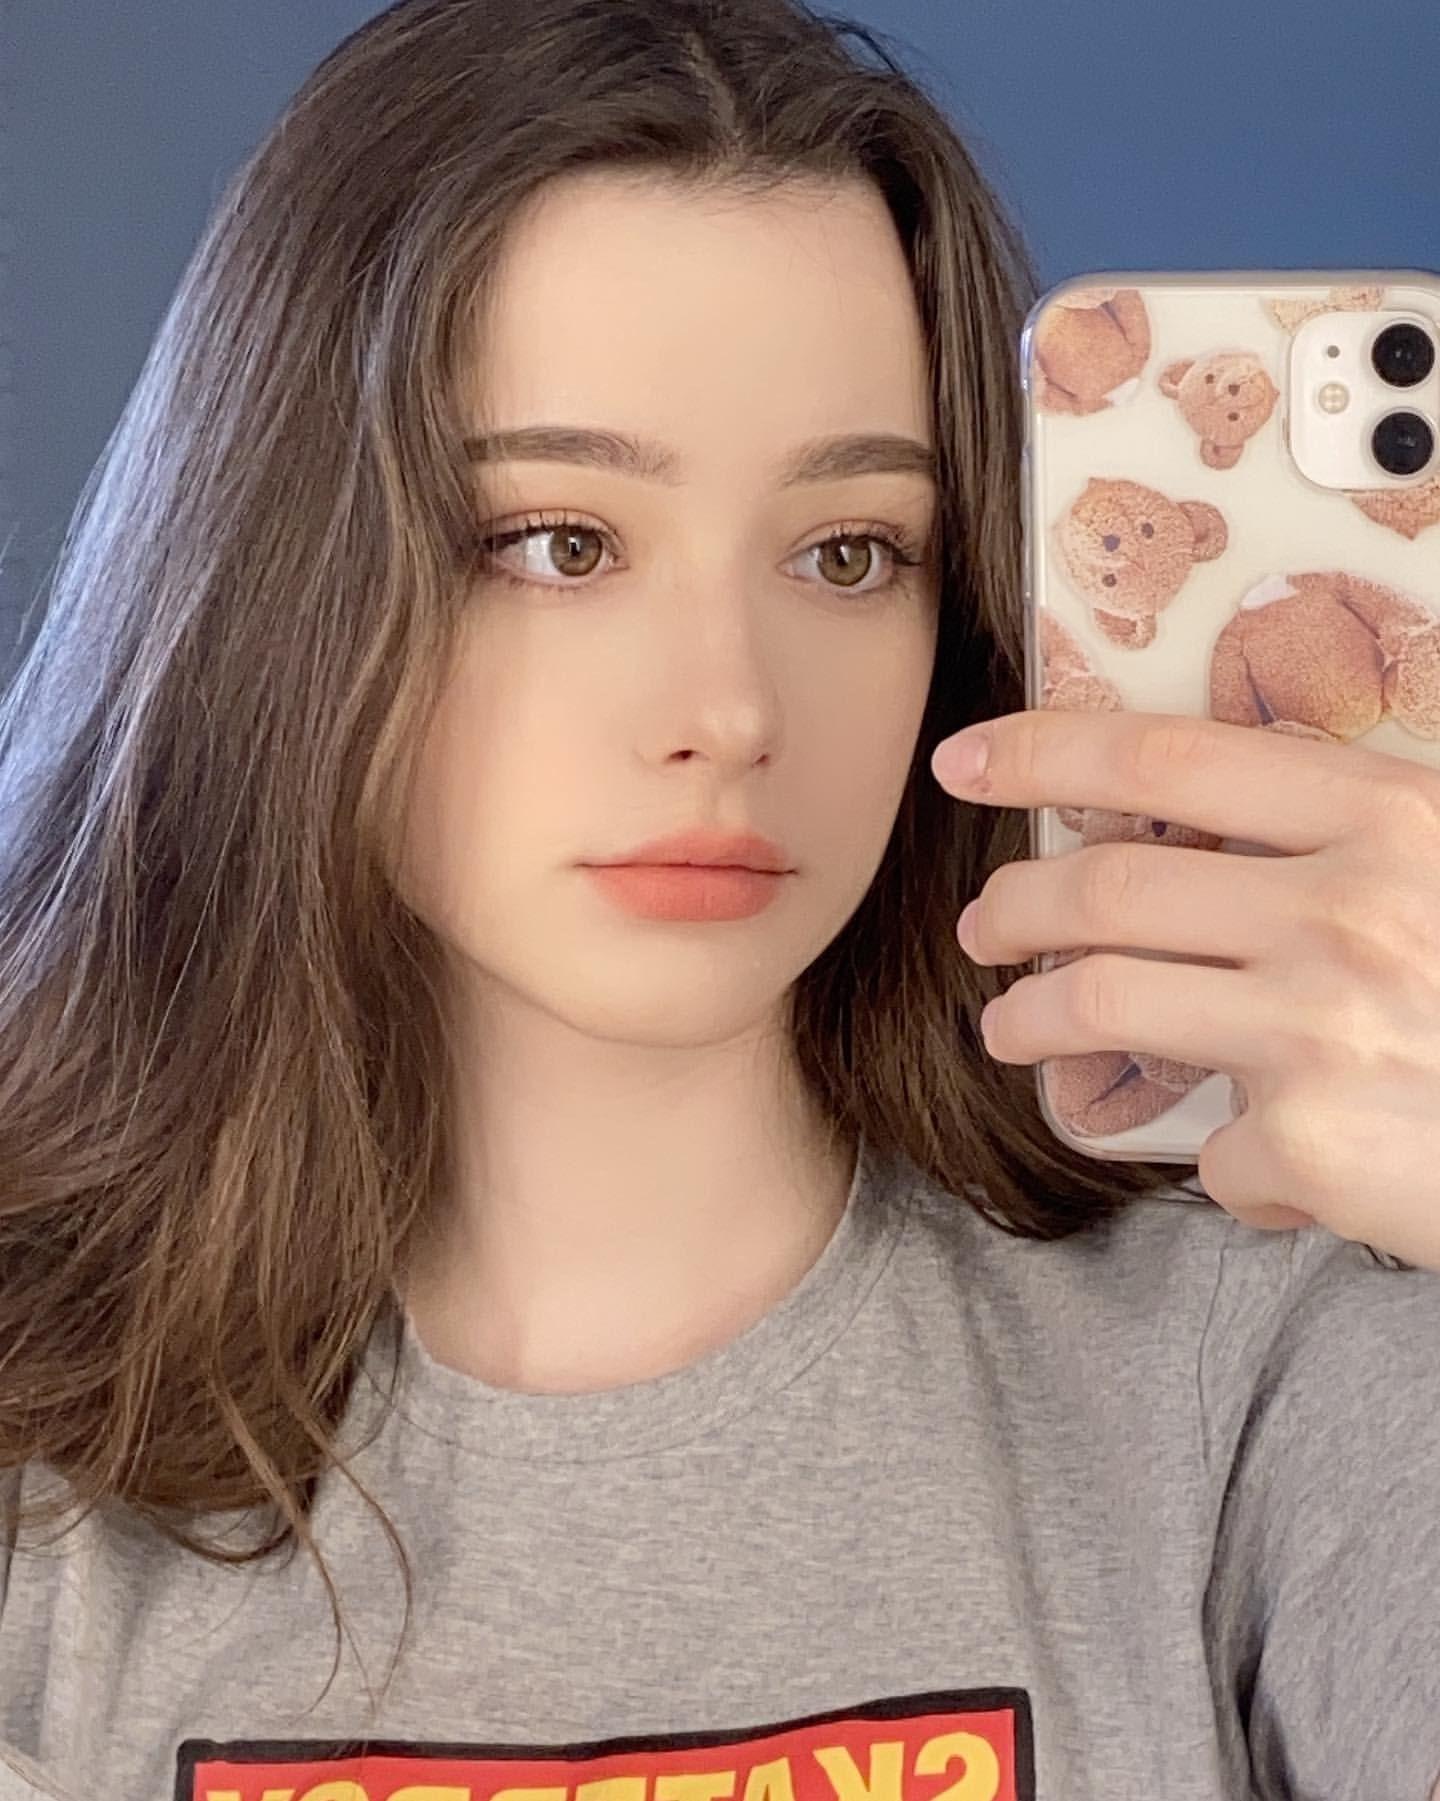 tarankaaa in 2020 Beautiful girl image, Cute beauty